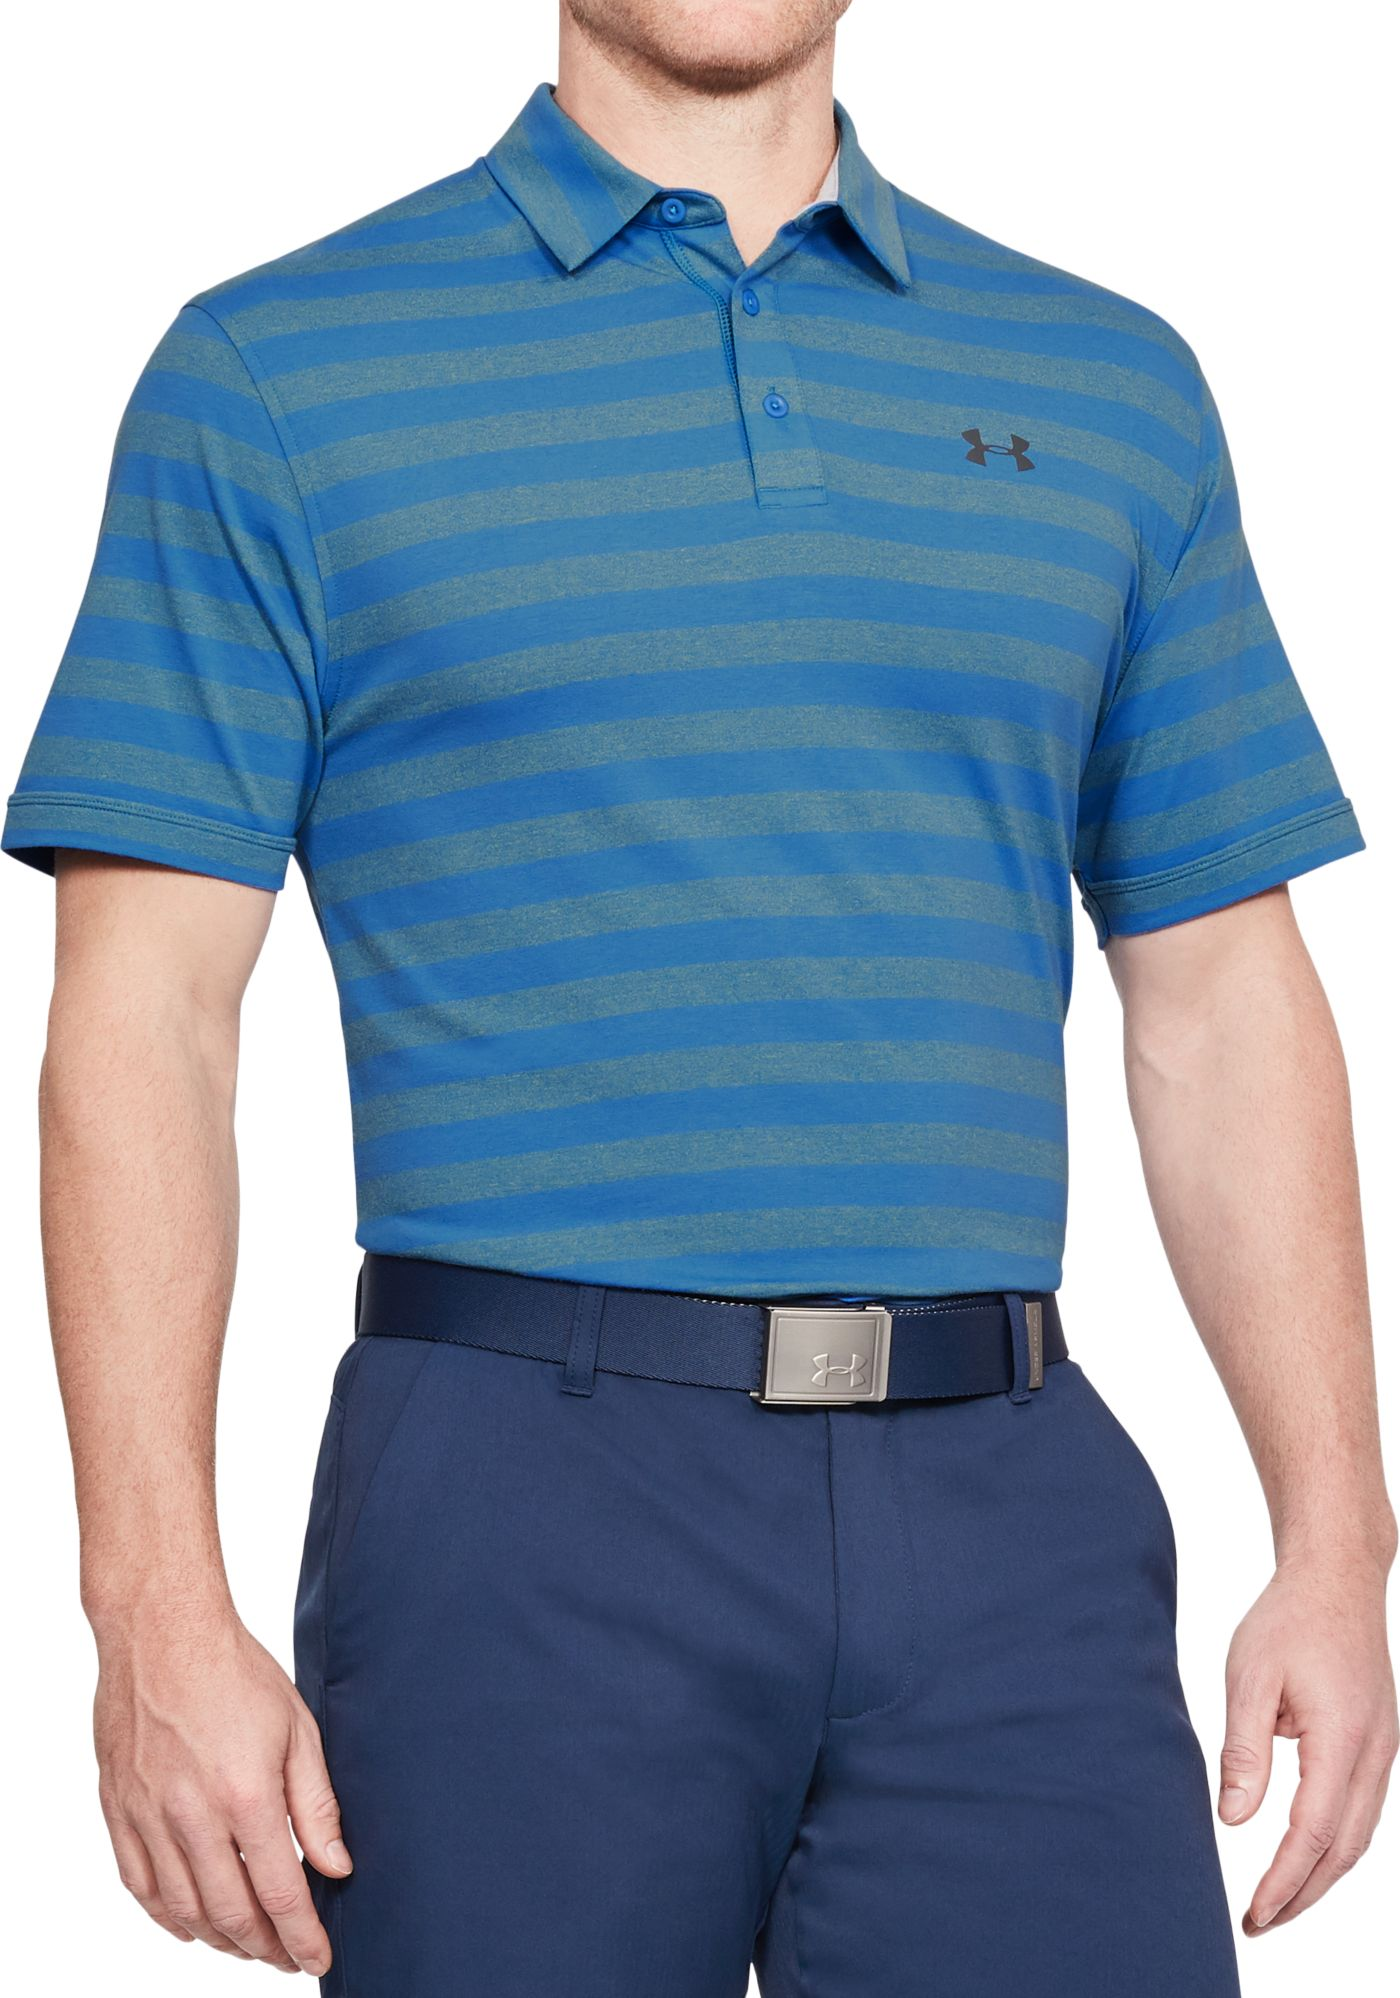 Under Armour Men's Charged Cotton Scramble Stripe Golf Polo